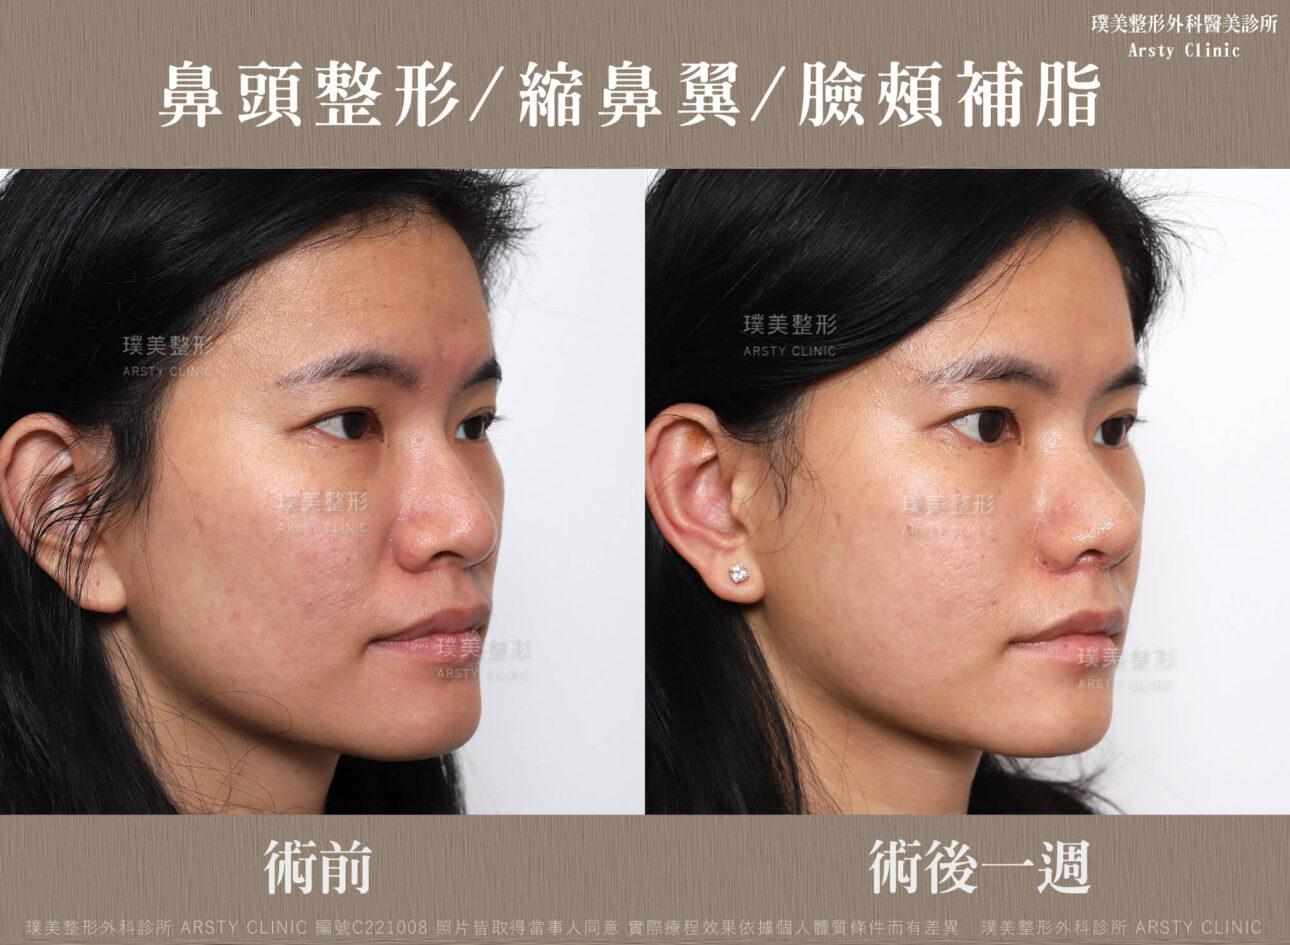 鼻頭整形 縮鼻翼 臉頰補脂 C221008BA一W04